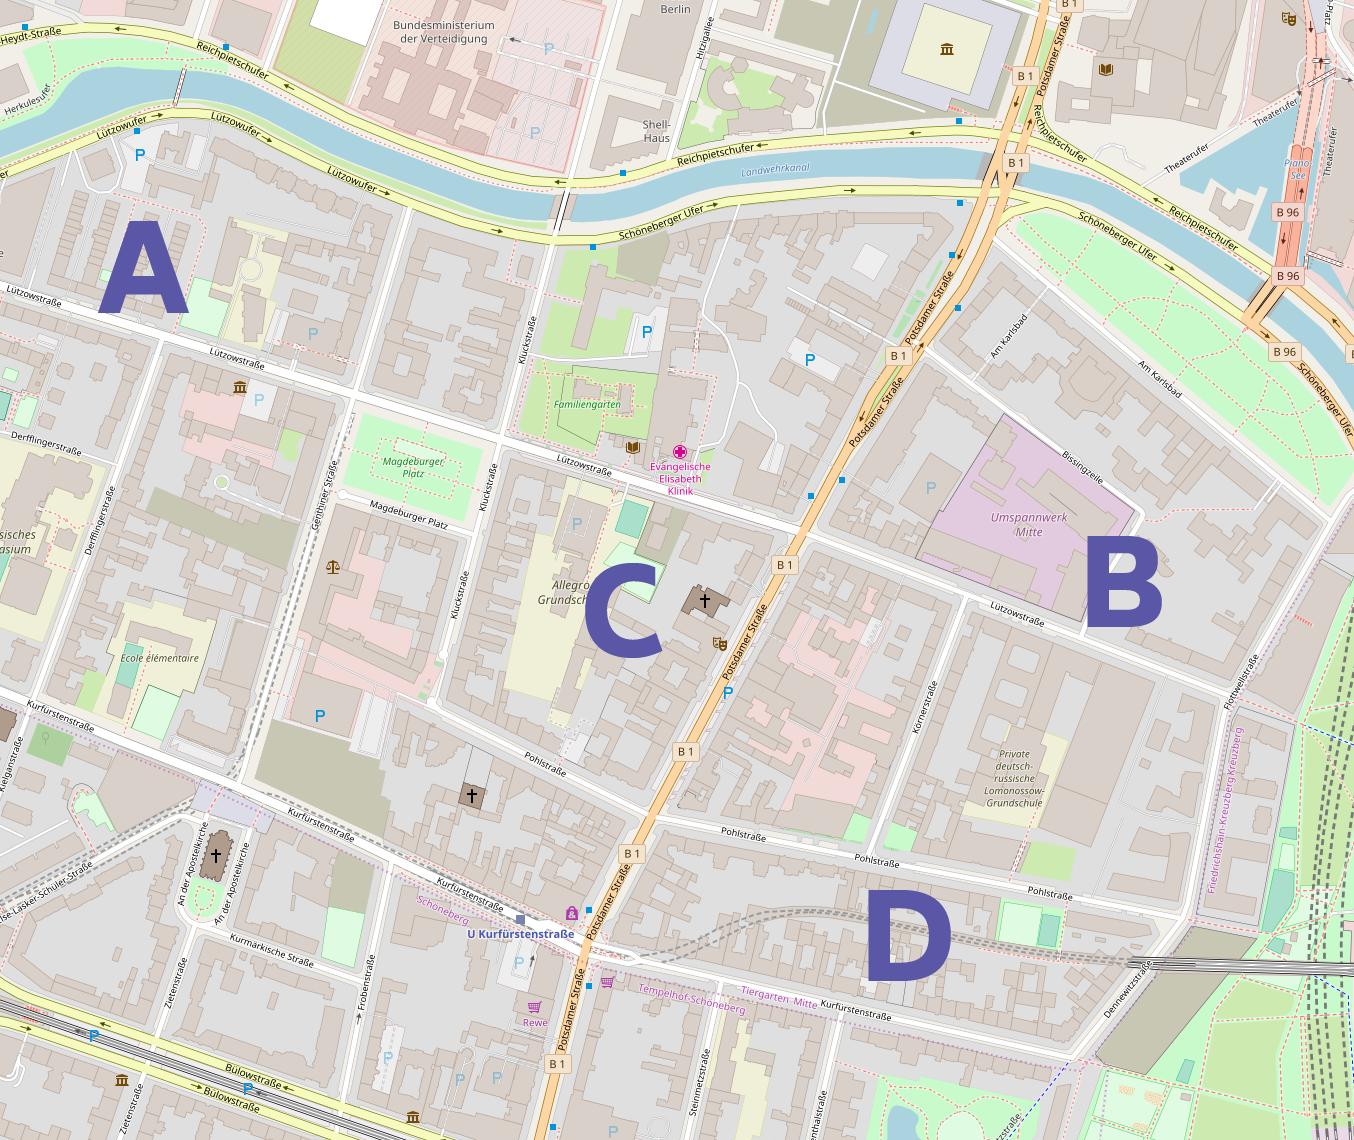 Four type history spots in Tiergarten